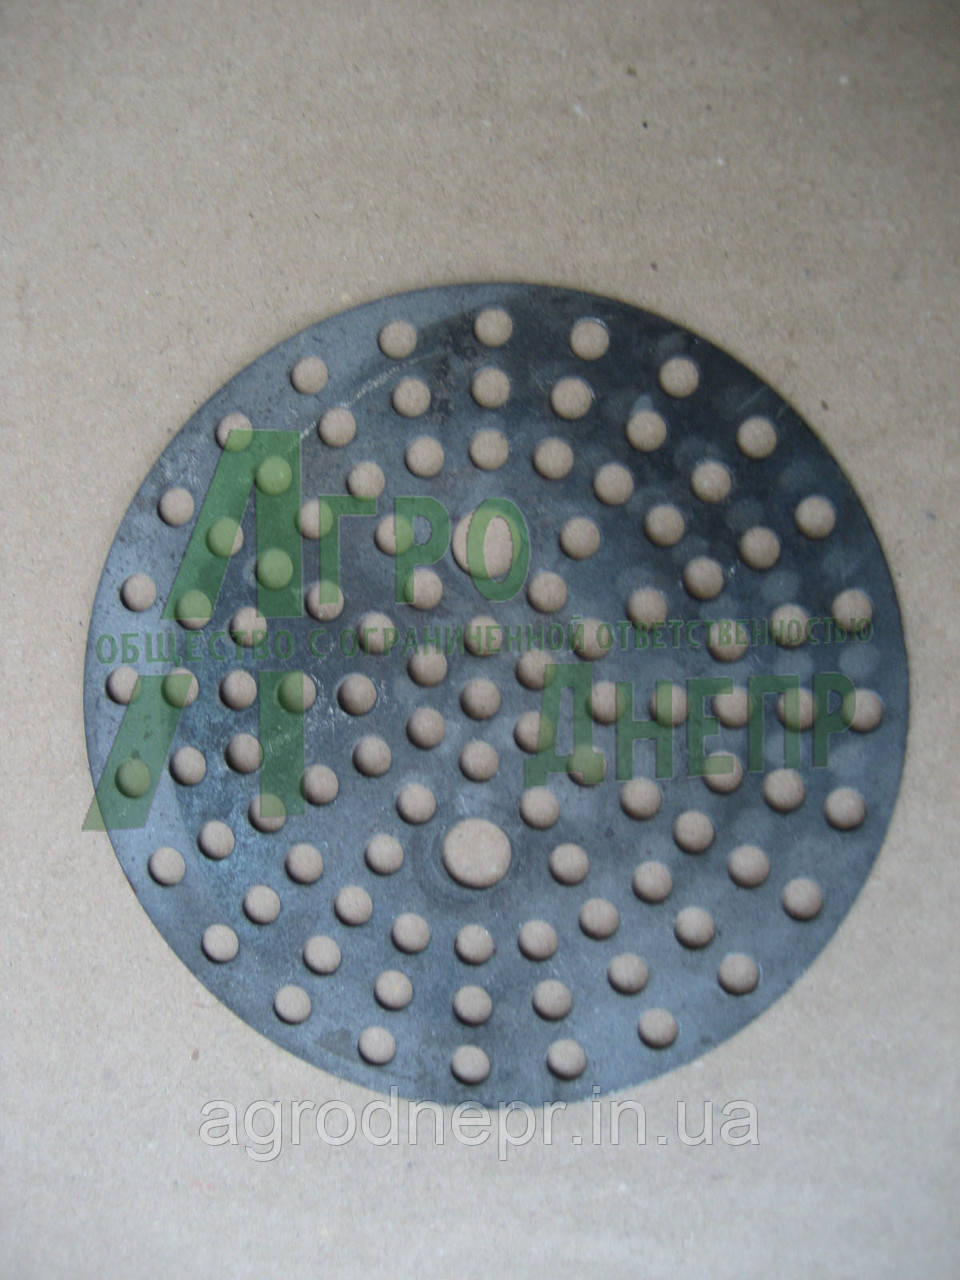 Сетка маслозаборника Д-65 Д08-034-А СБ